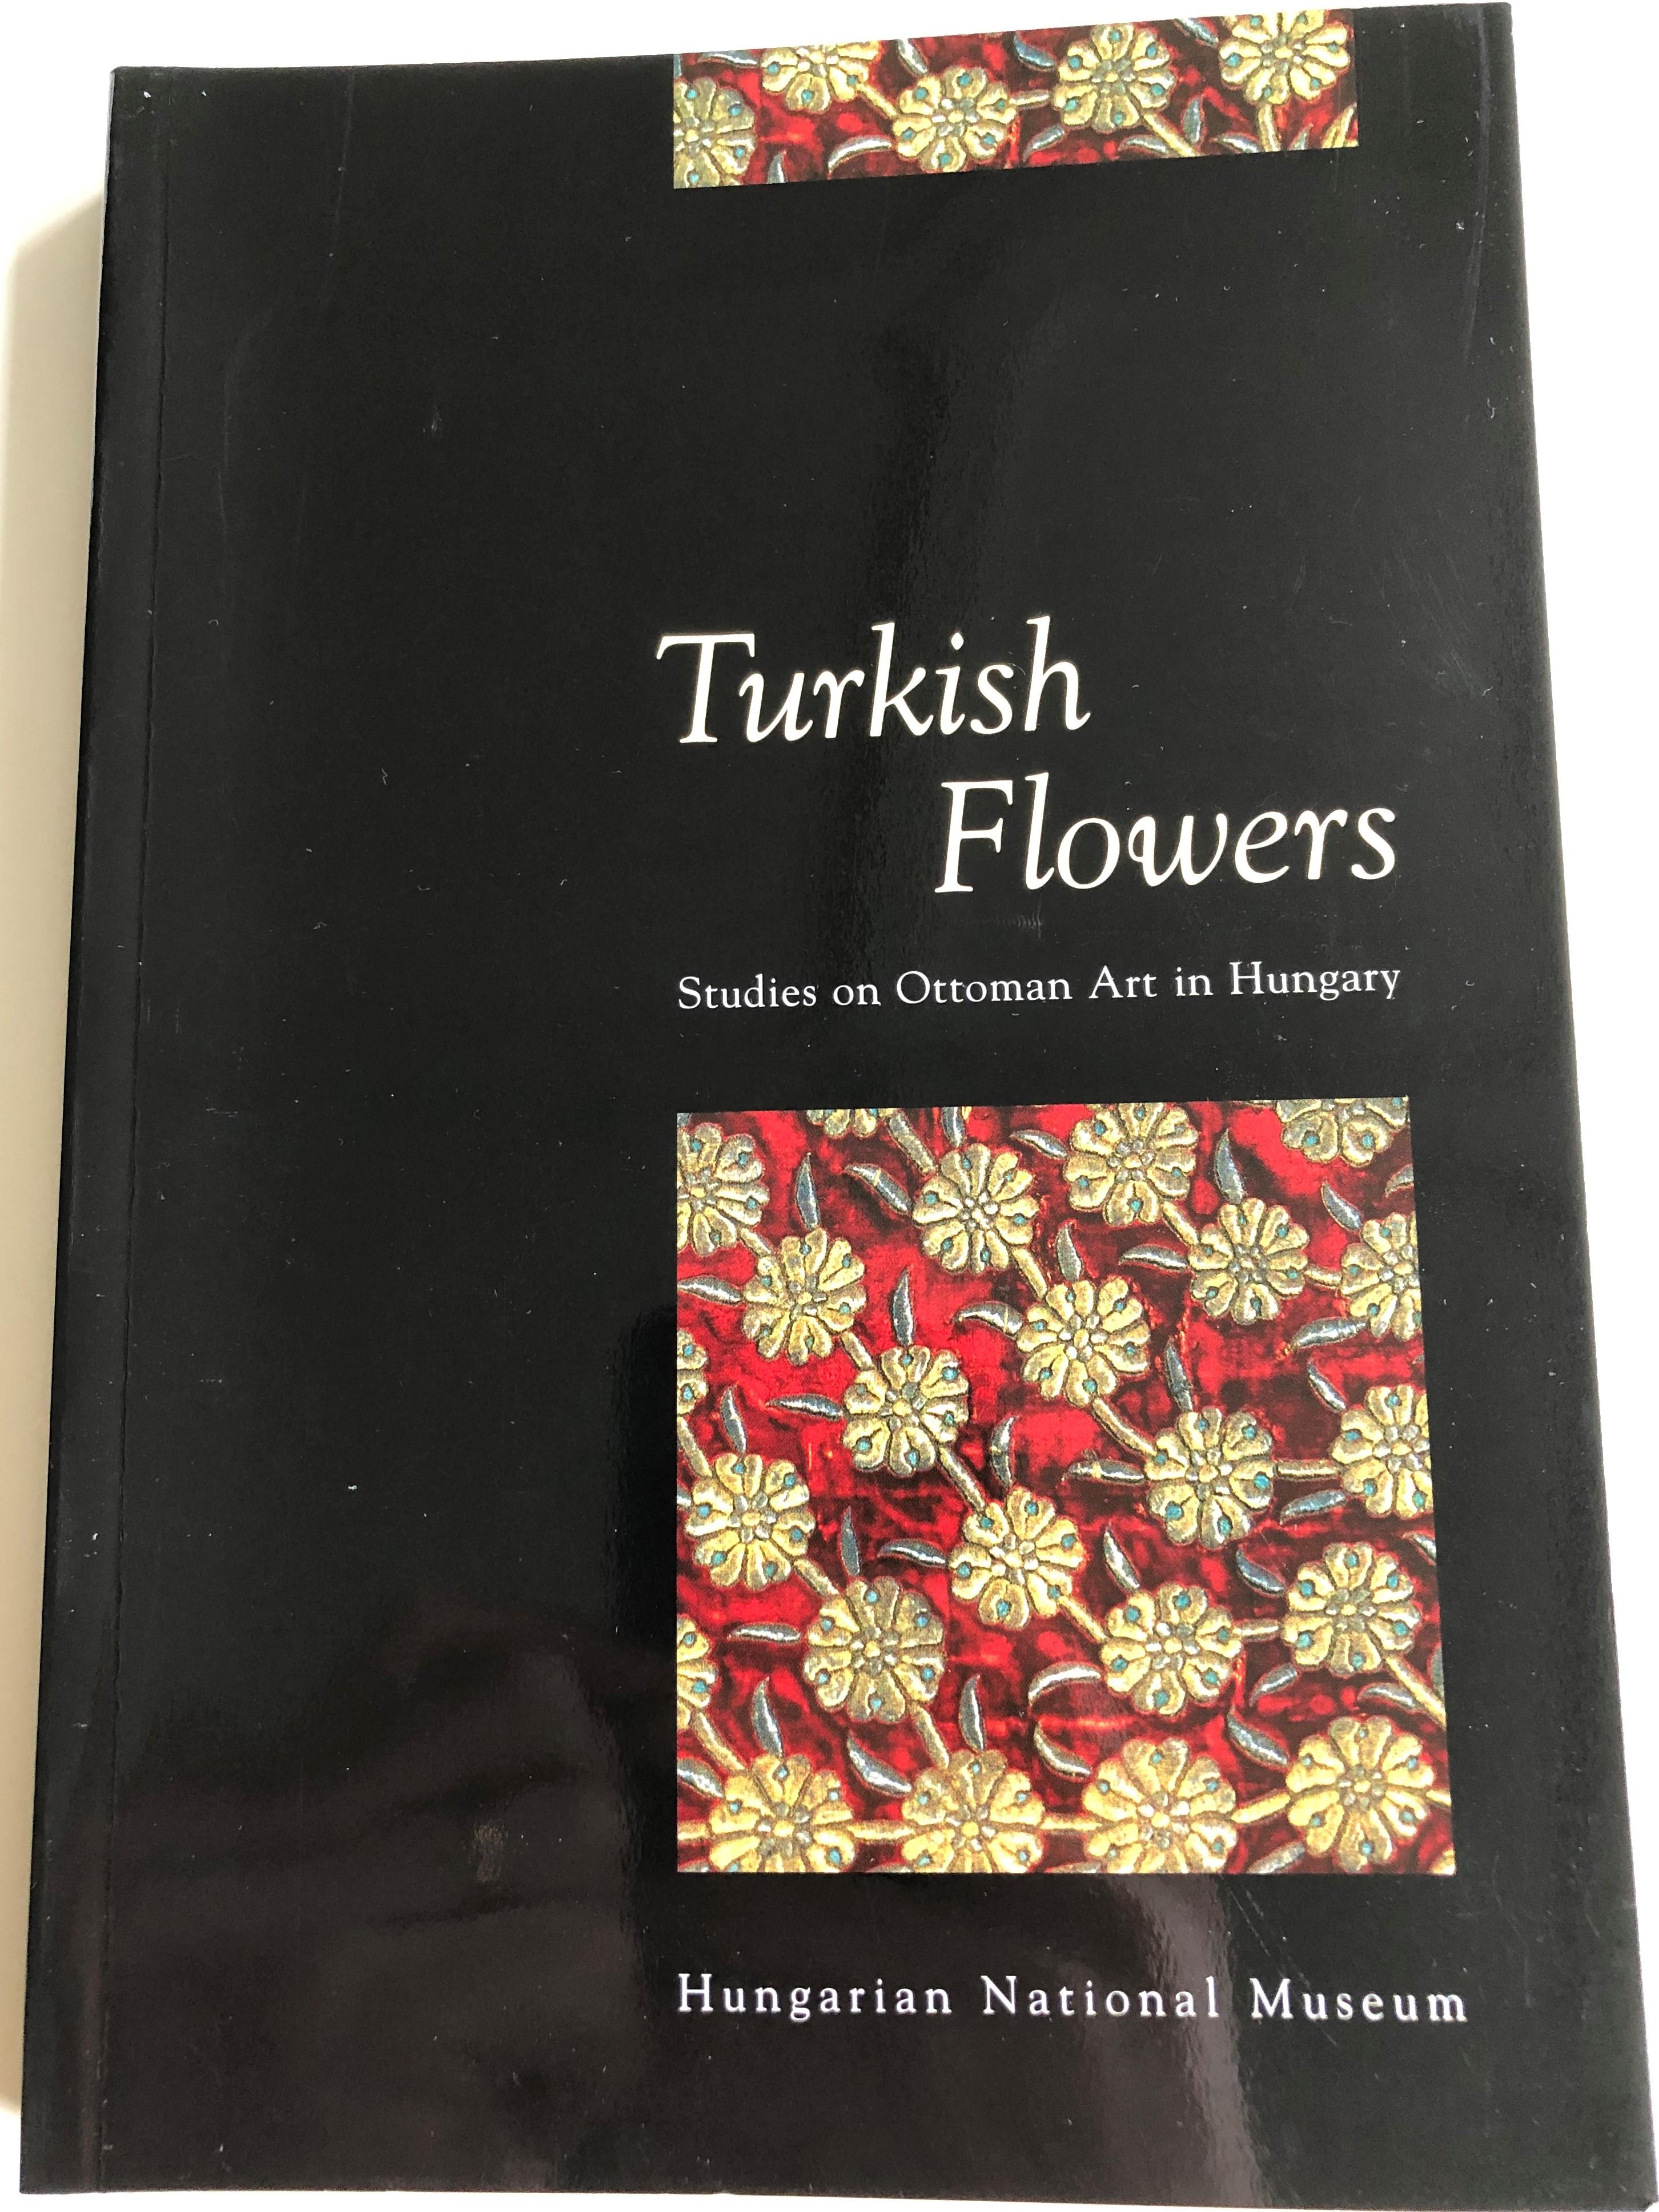 turkish-flowers-studies-on-ottoman-art-in-hungary-hungarian-national-museum-2005-editor-ibolya-gerelyes-1-.jpg